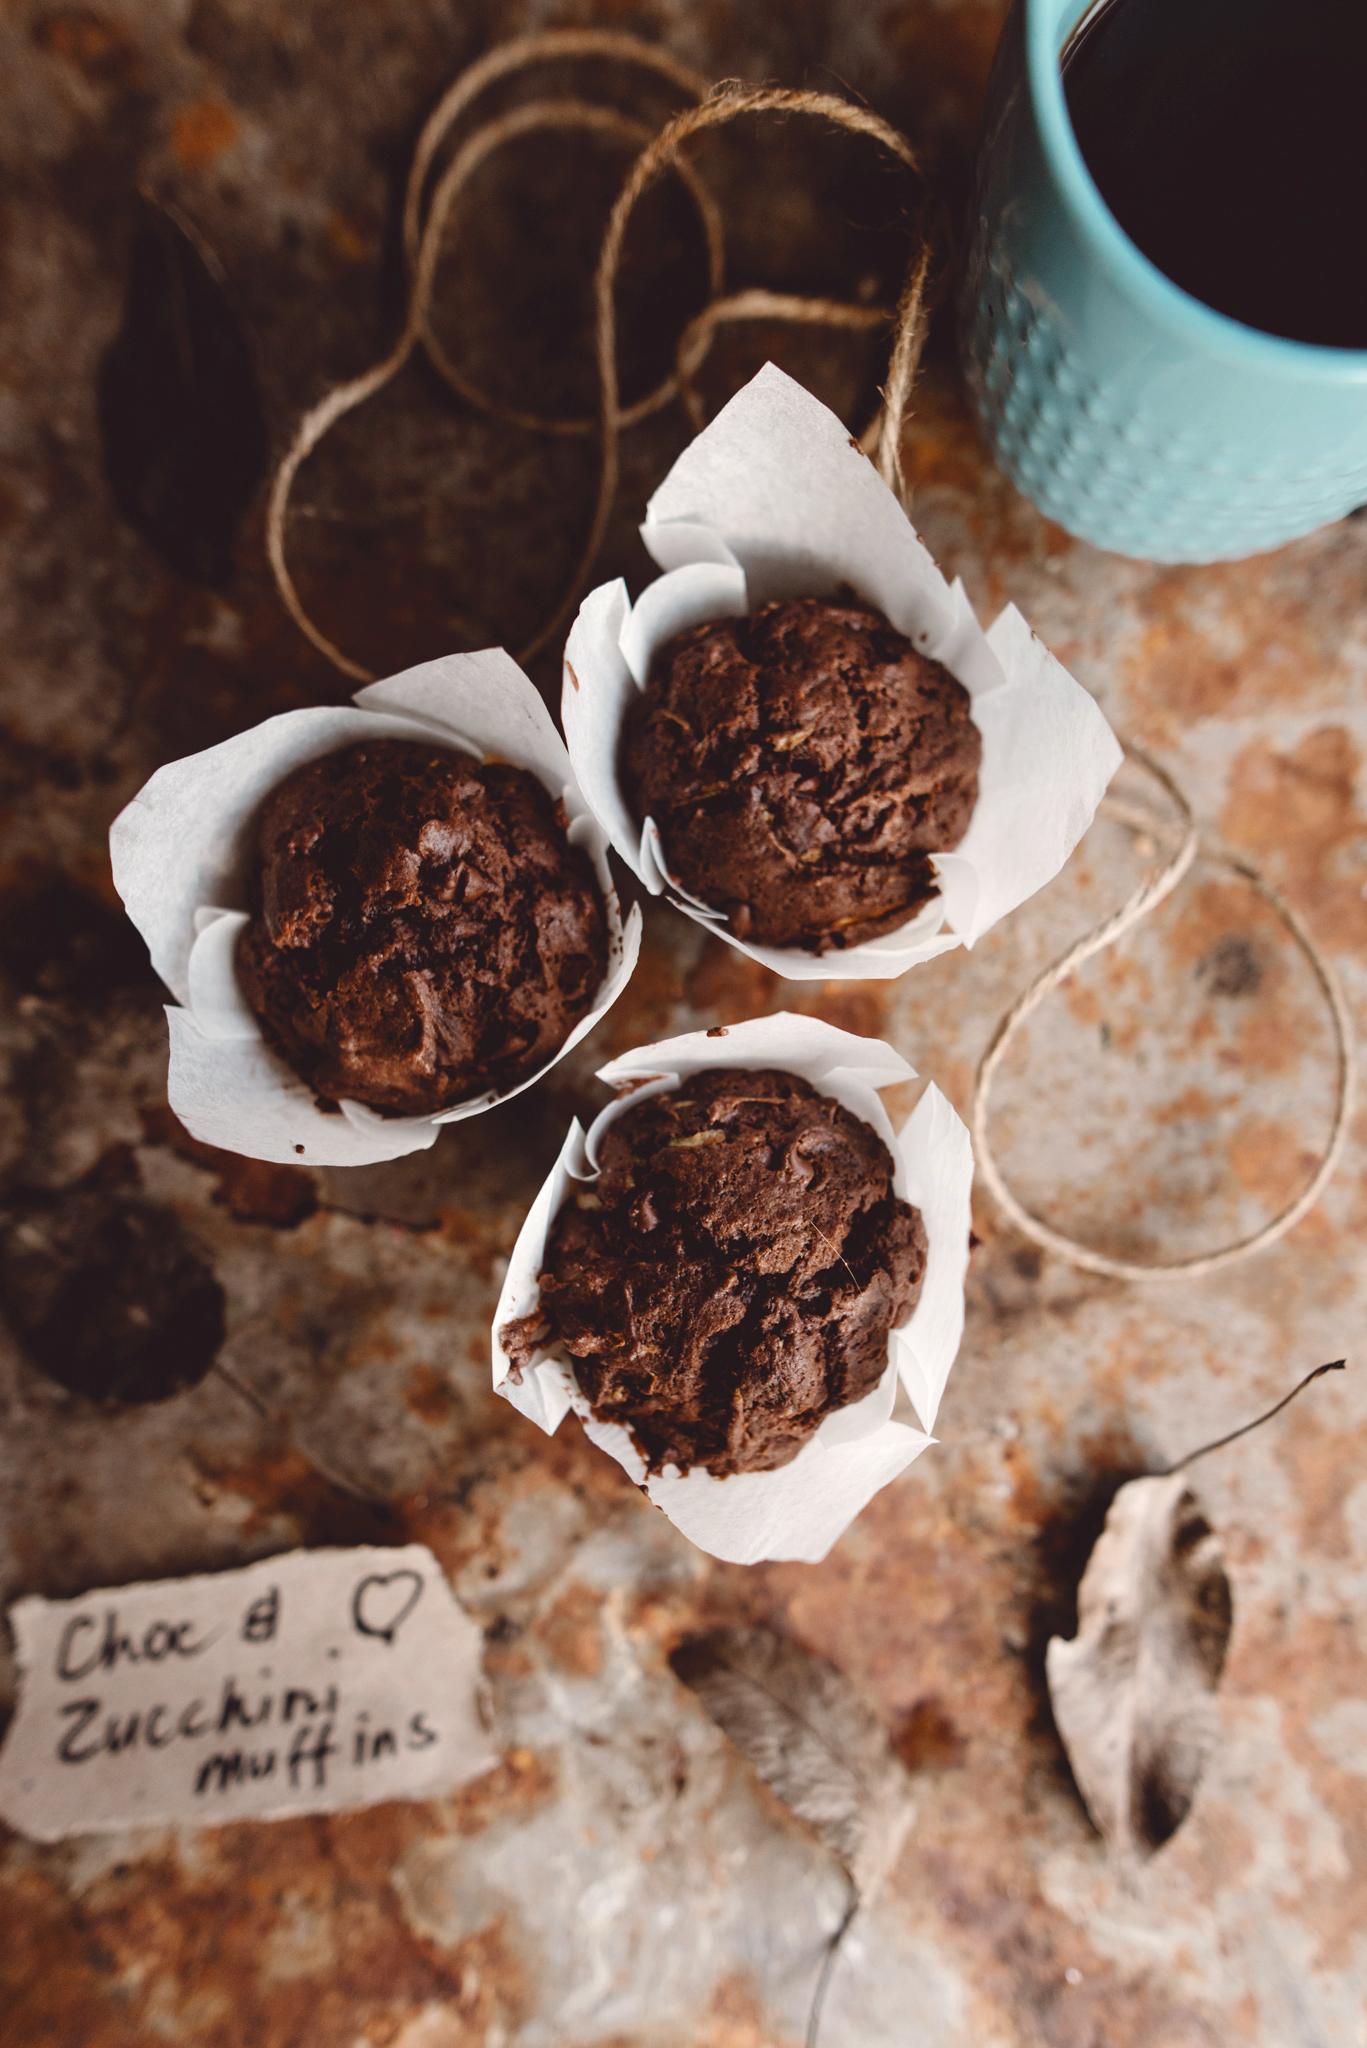 food-photographer-sydney-muffins-on-a-flatlay